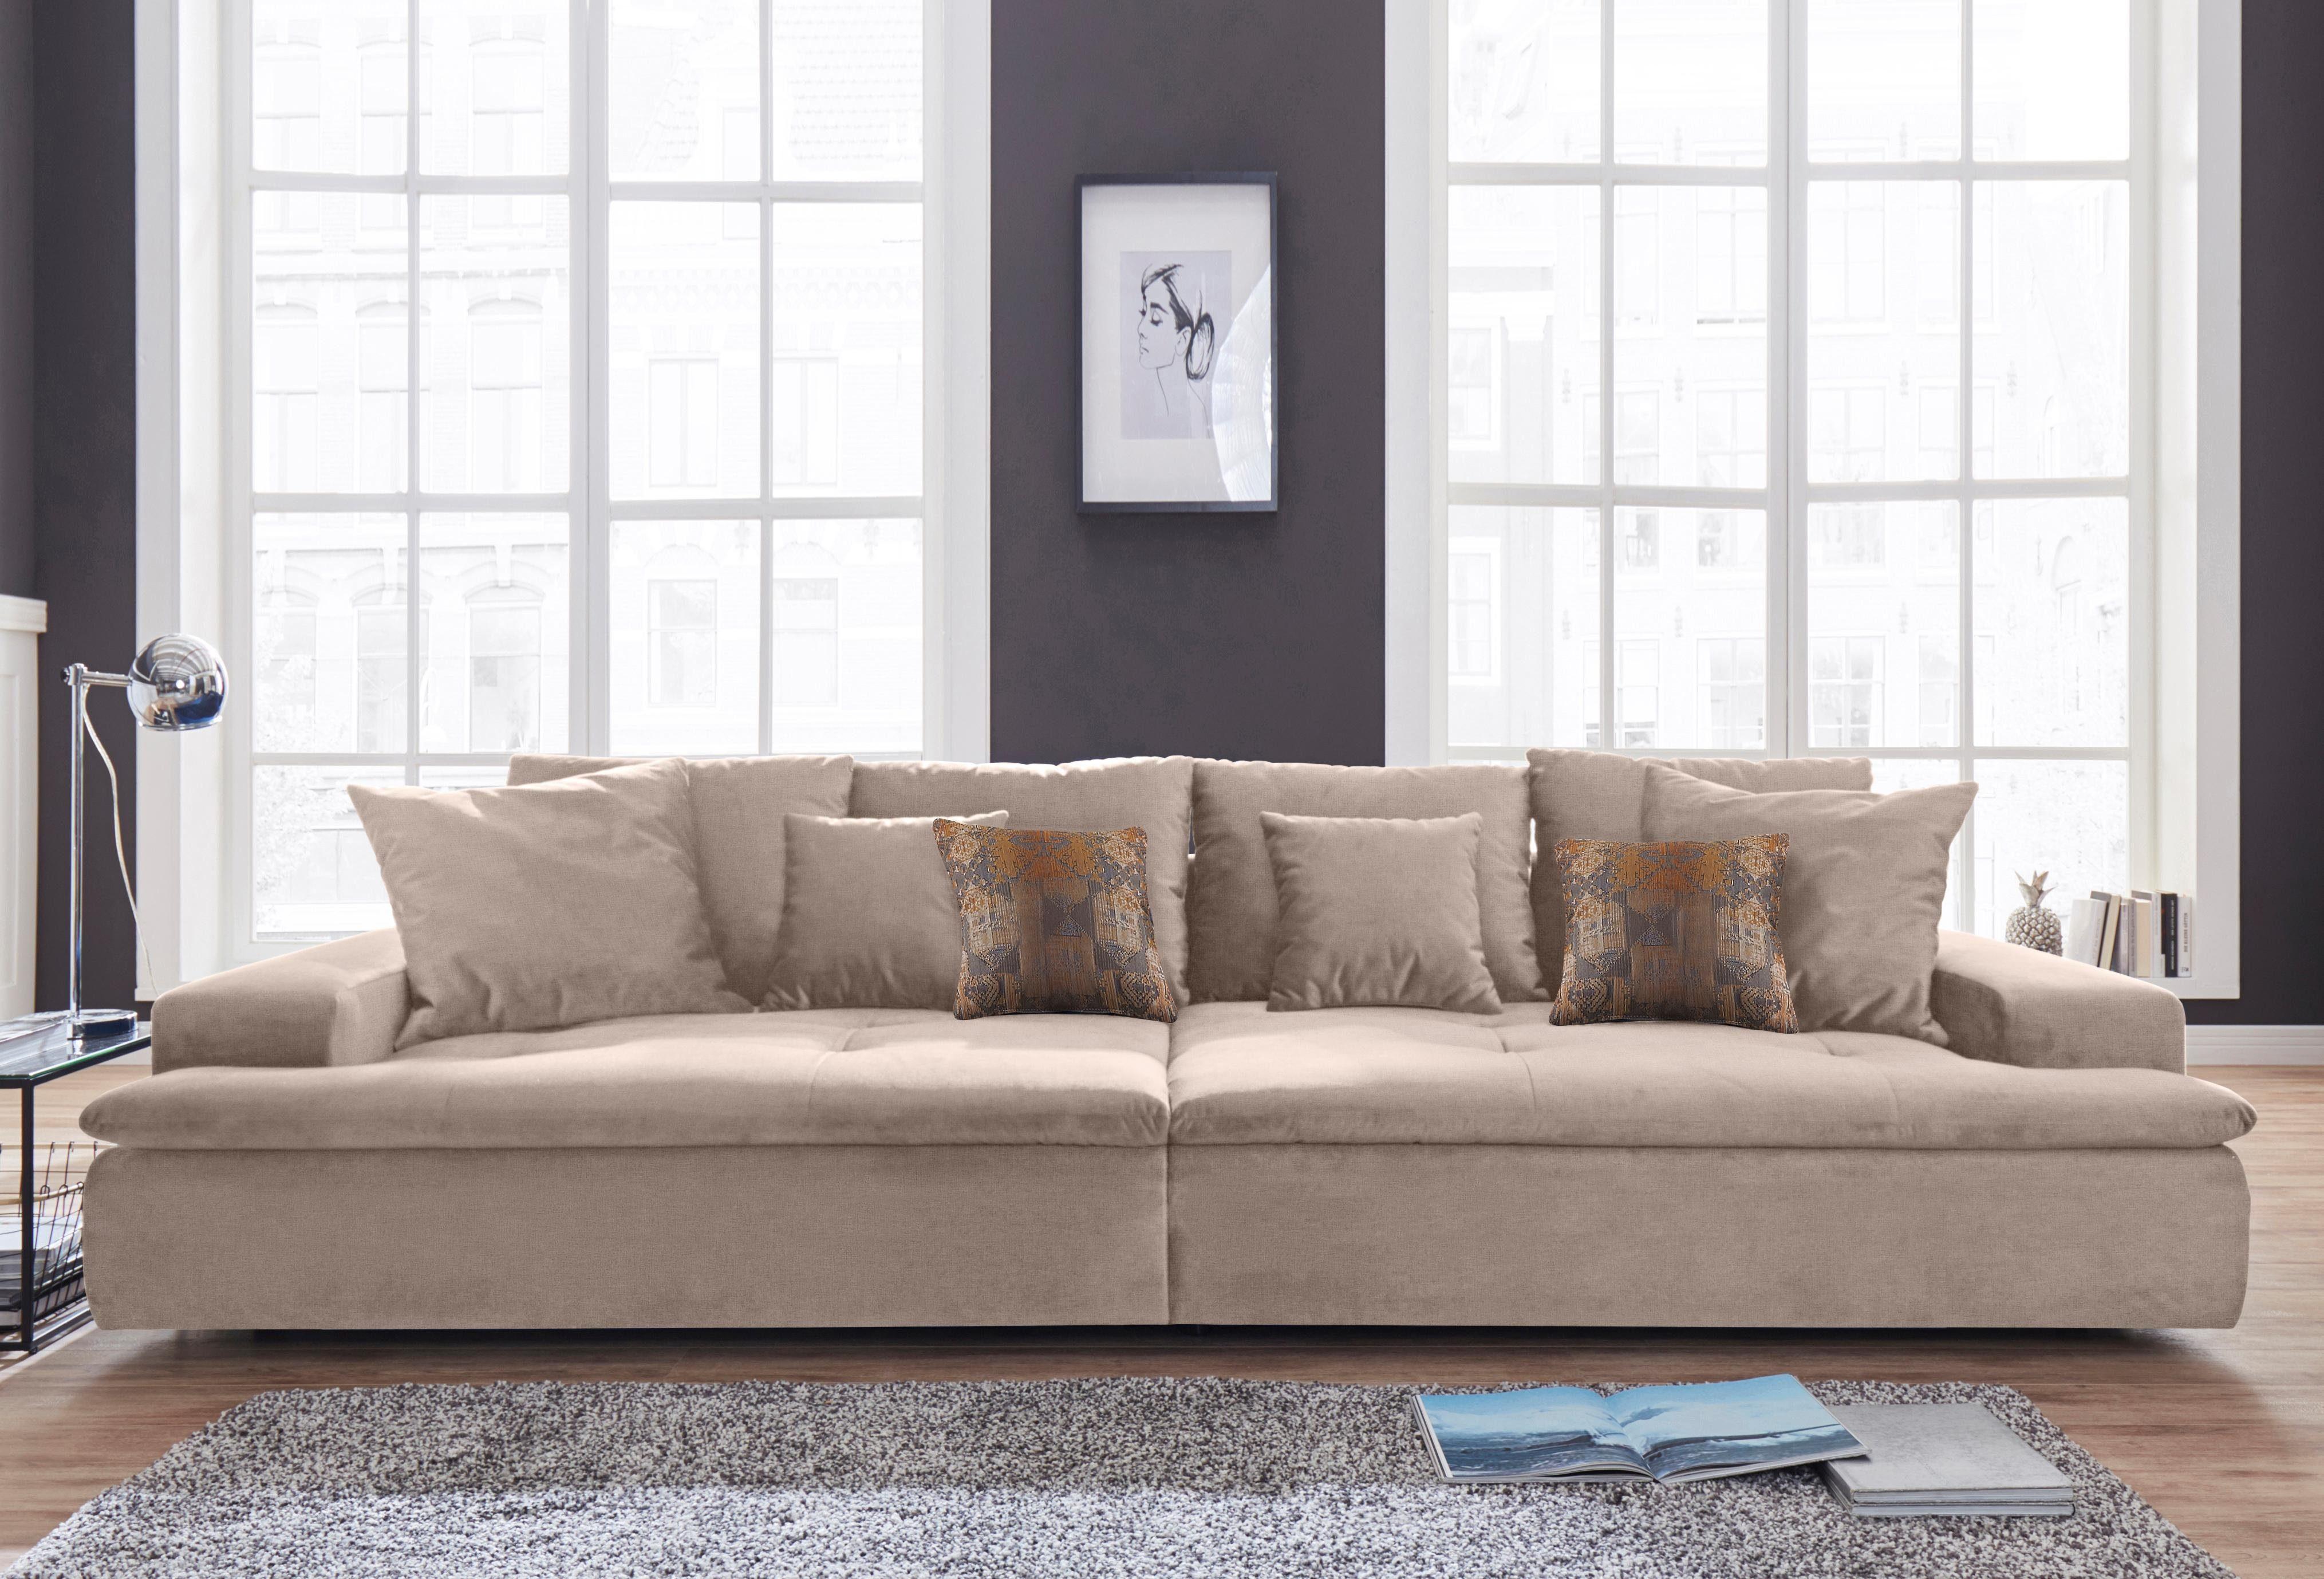 Nova Via Big-Sofa, wahlweise mit RGB-LED